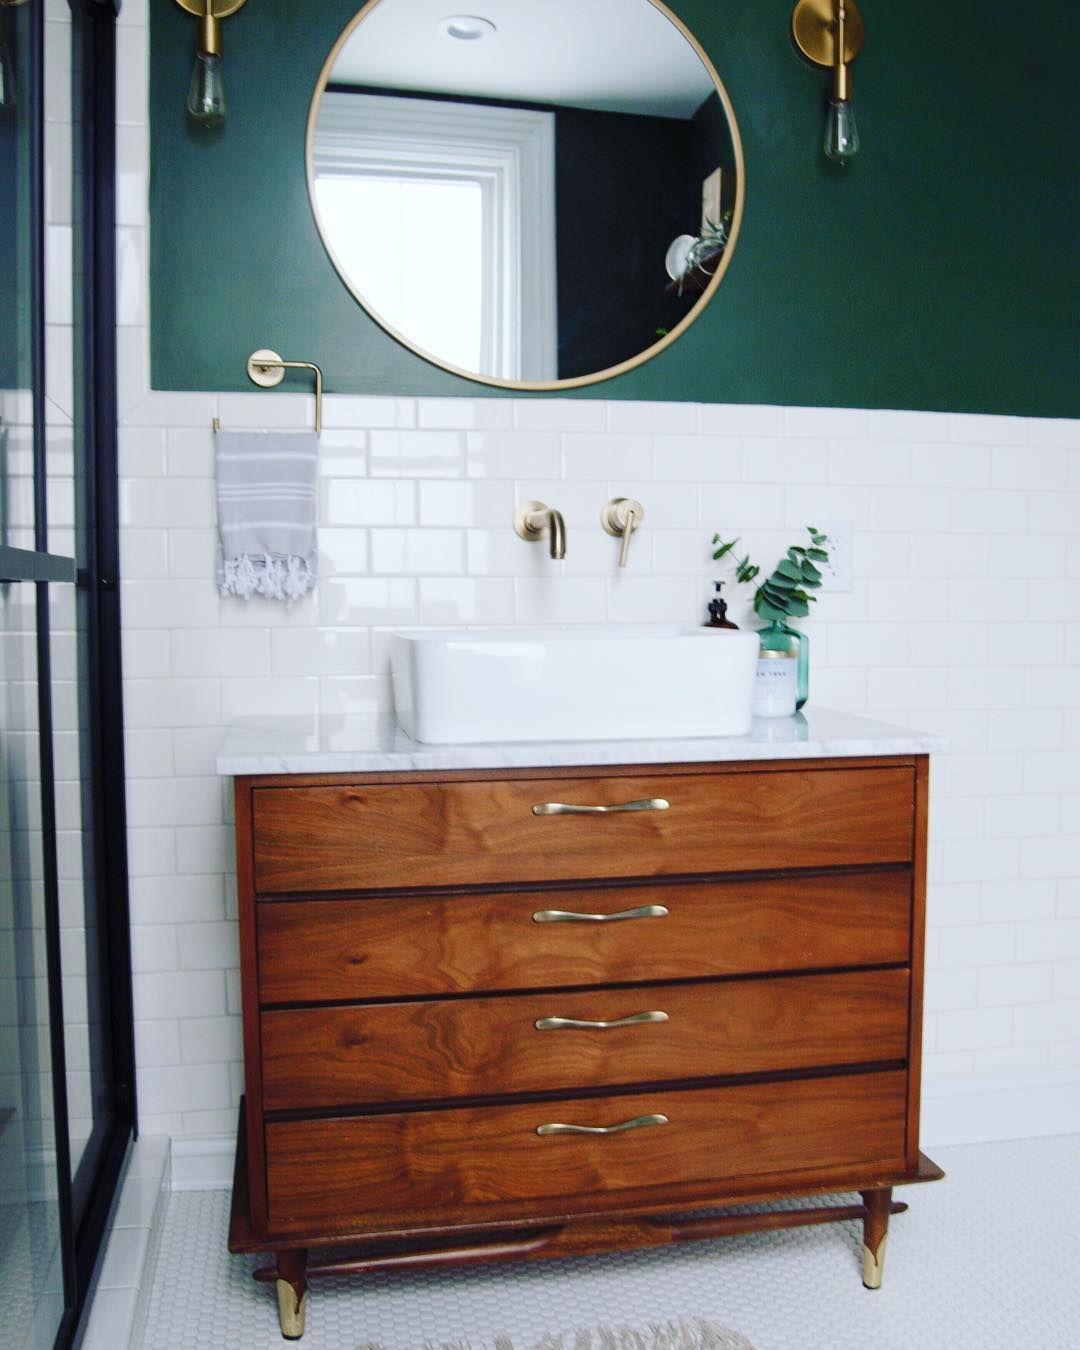 Mid Century Modern Dresser Vanity Bathroom Midcentury Dresser Vanity Bathroom Modern Bathroom Design Mid Century Modern Bathroom [ 1350 x 1080 Pixel ]